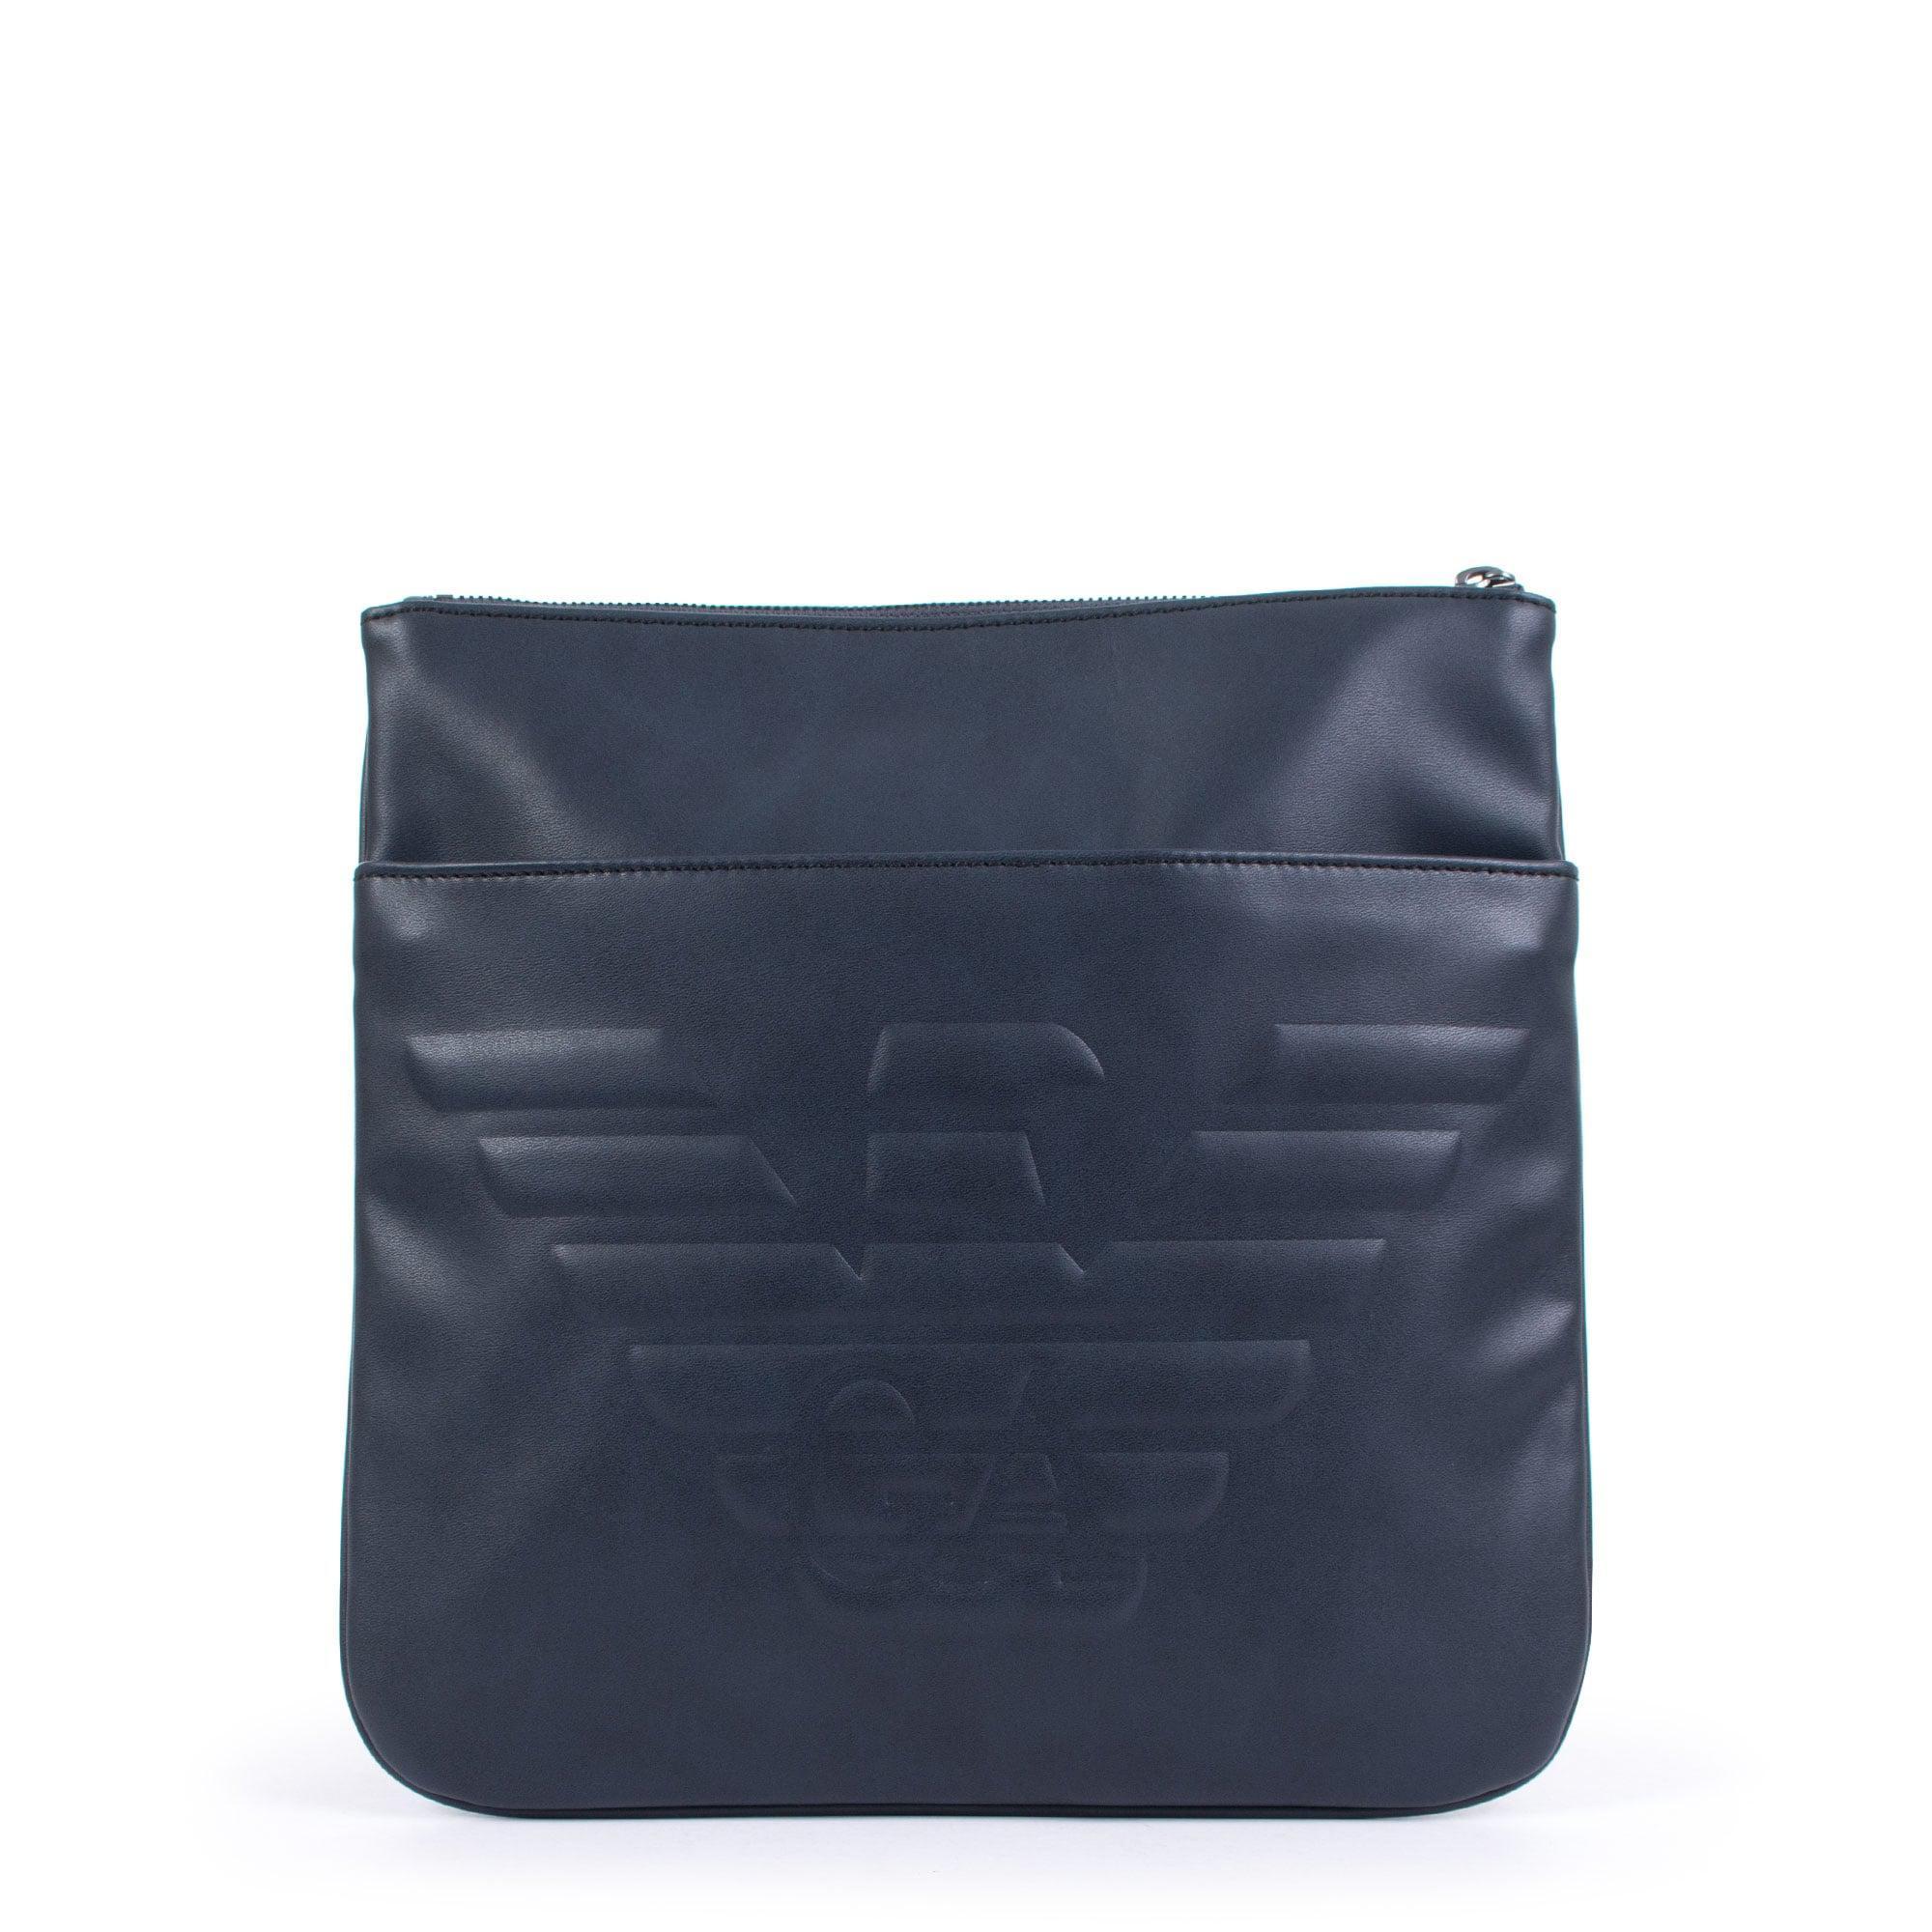 Emporio Armani Logo Cross Body Bag In Navy in Blue for Men - Lyst 4848f69bc833c